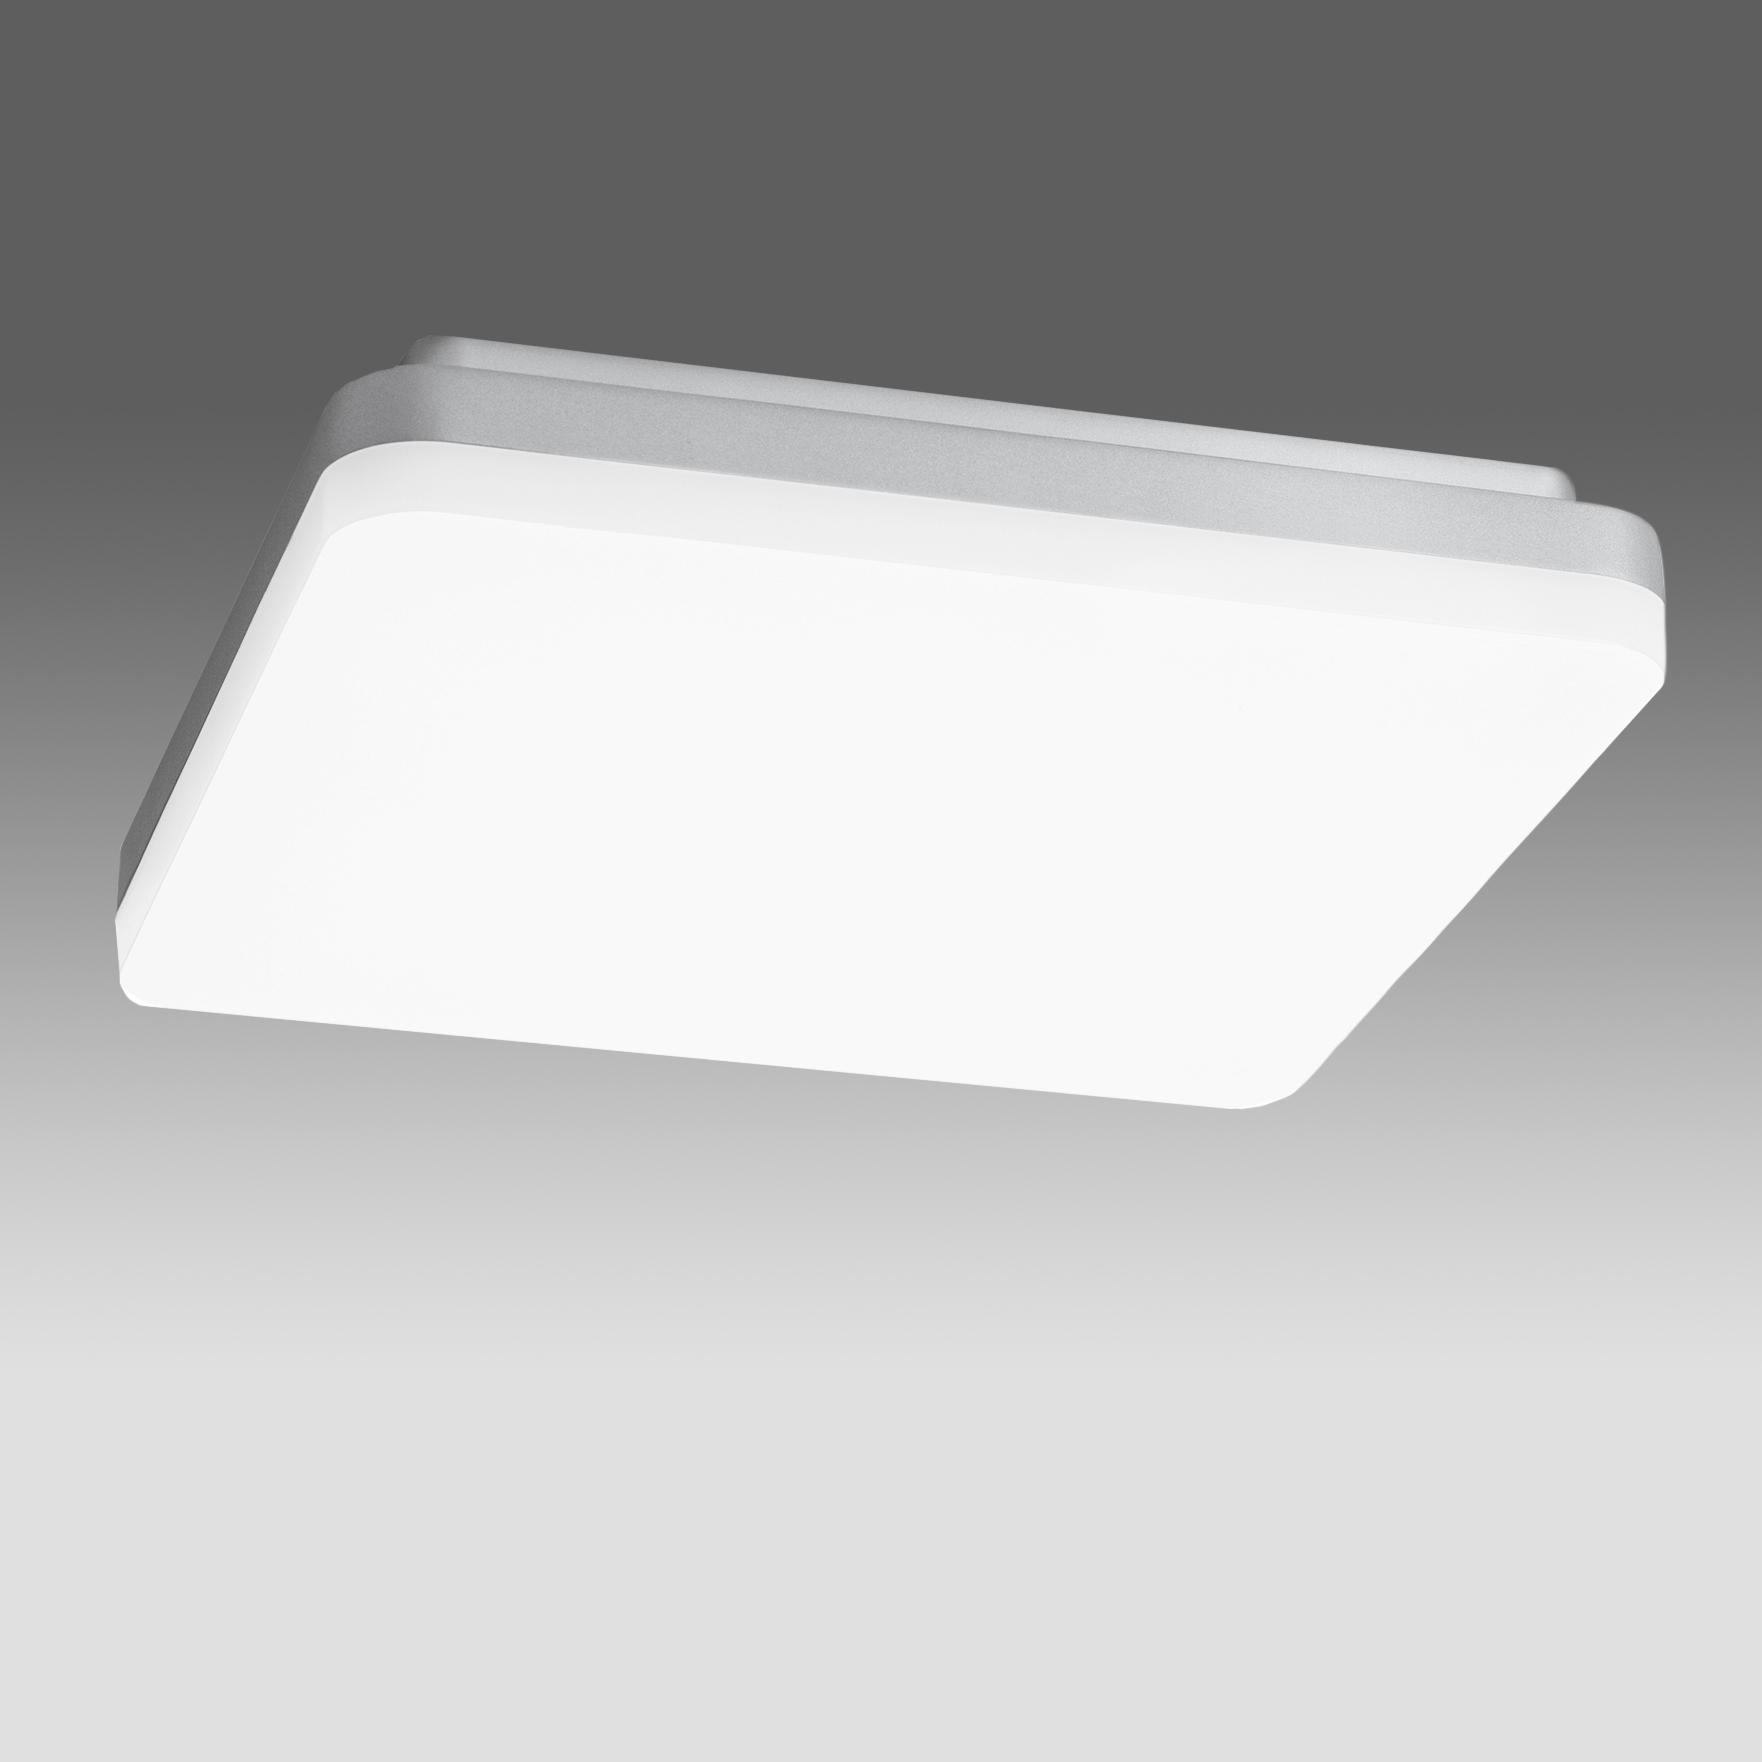 1 Stk Elegance Square III 27W 2800lm 3000K Triac Dim IP20 silber LILE0038--